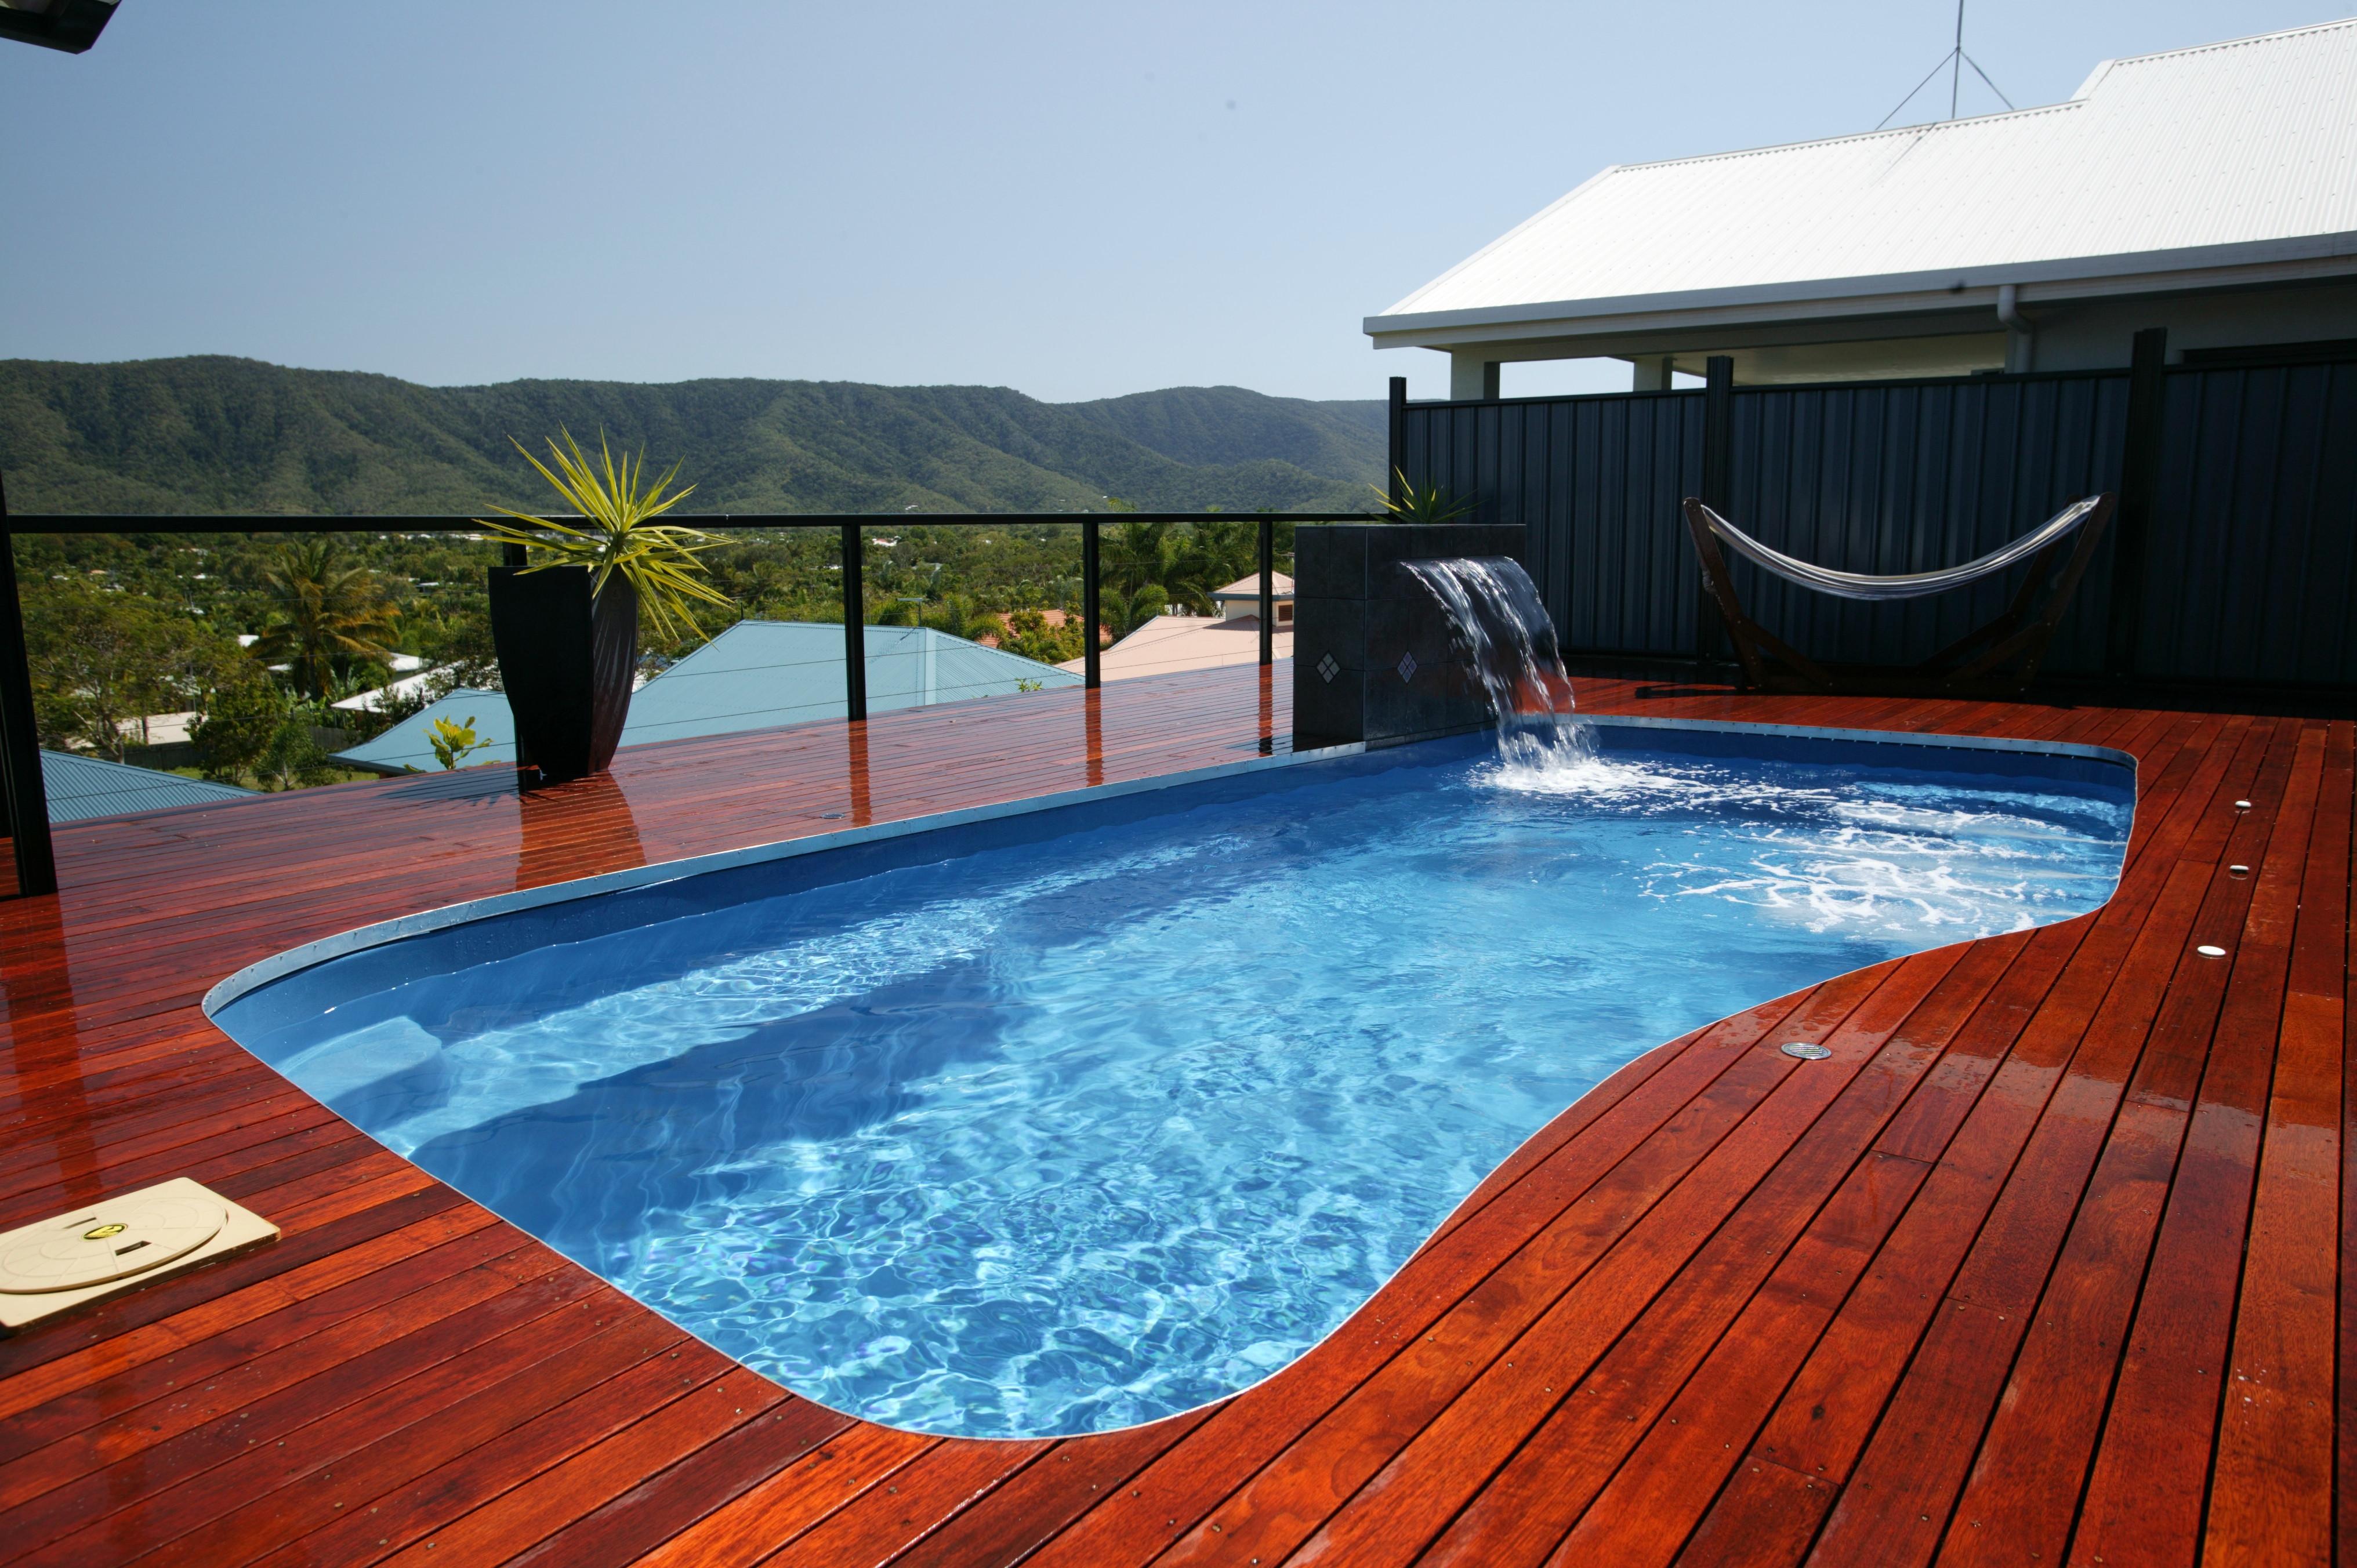 25 Jul Backyard Landscaping Ideas Swimming Pool Design Homesthetics 11